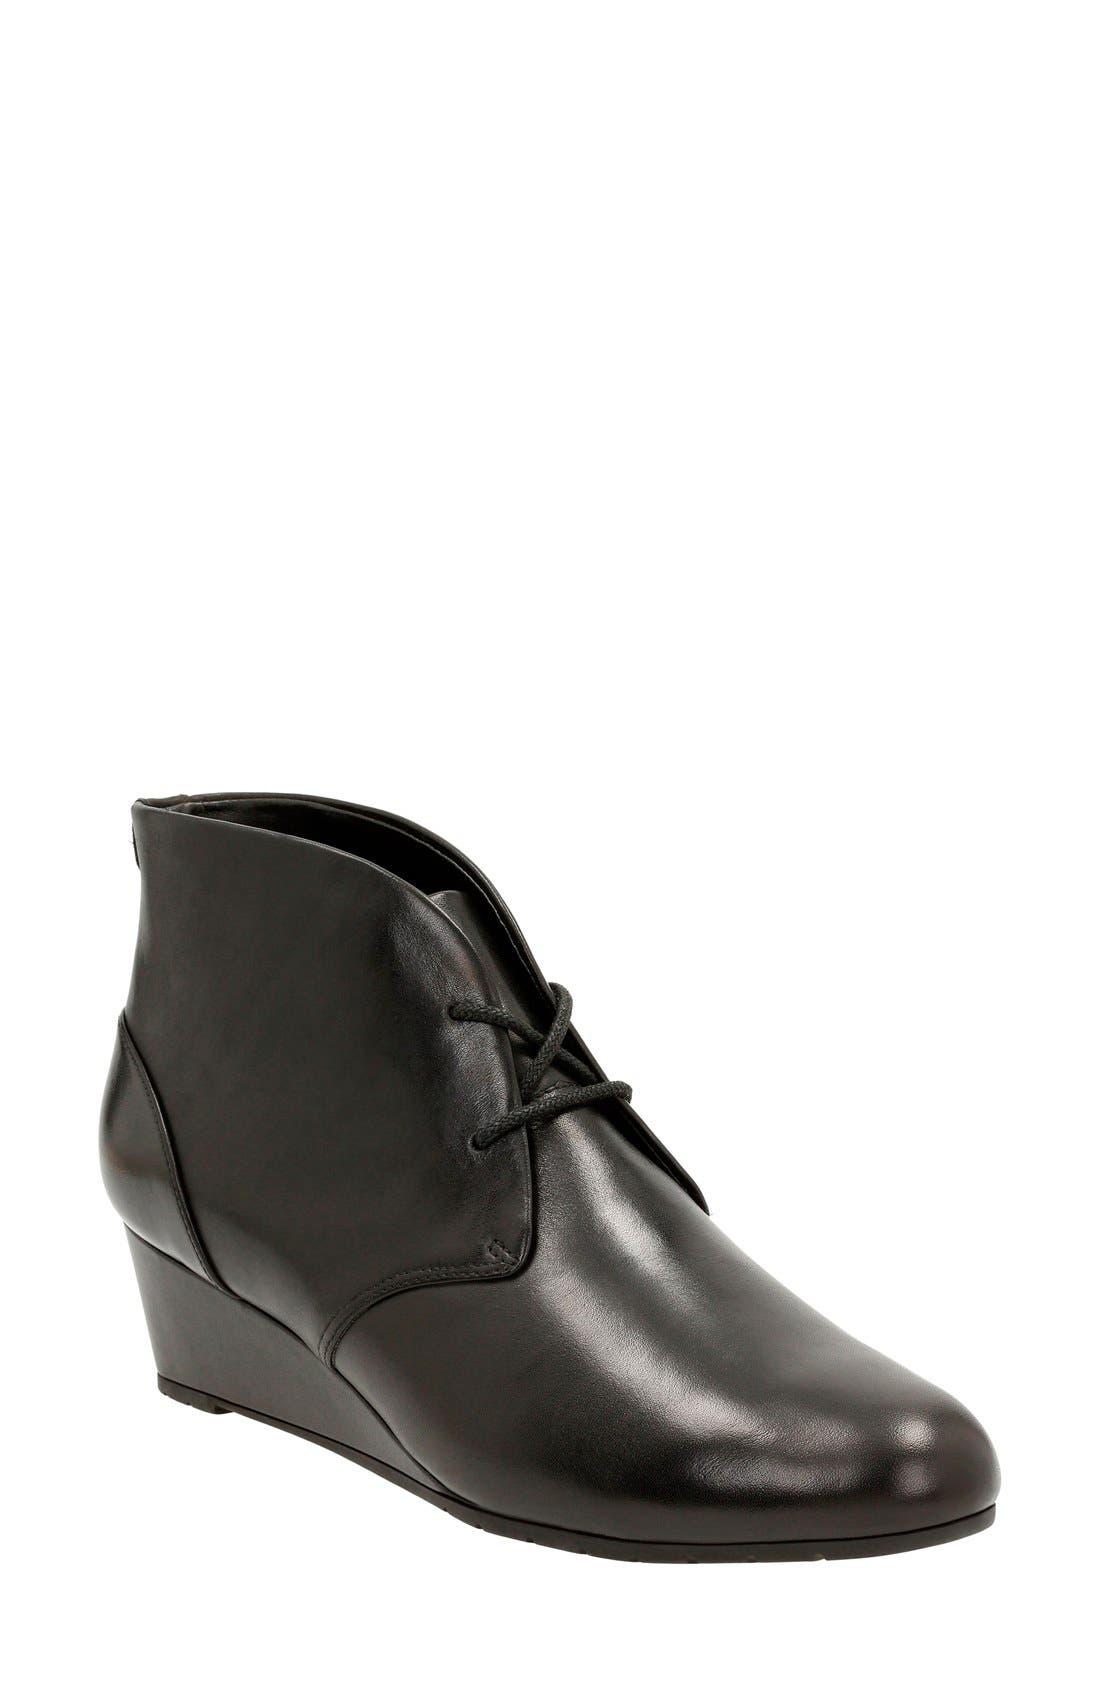 'Vendra Peak' Wedge Boot,                         Main,                         color, Black Leather